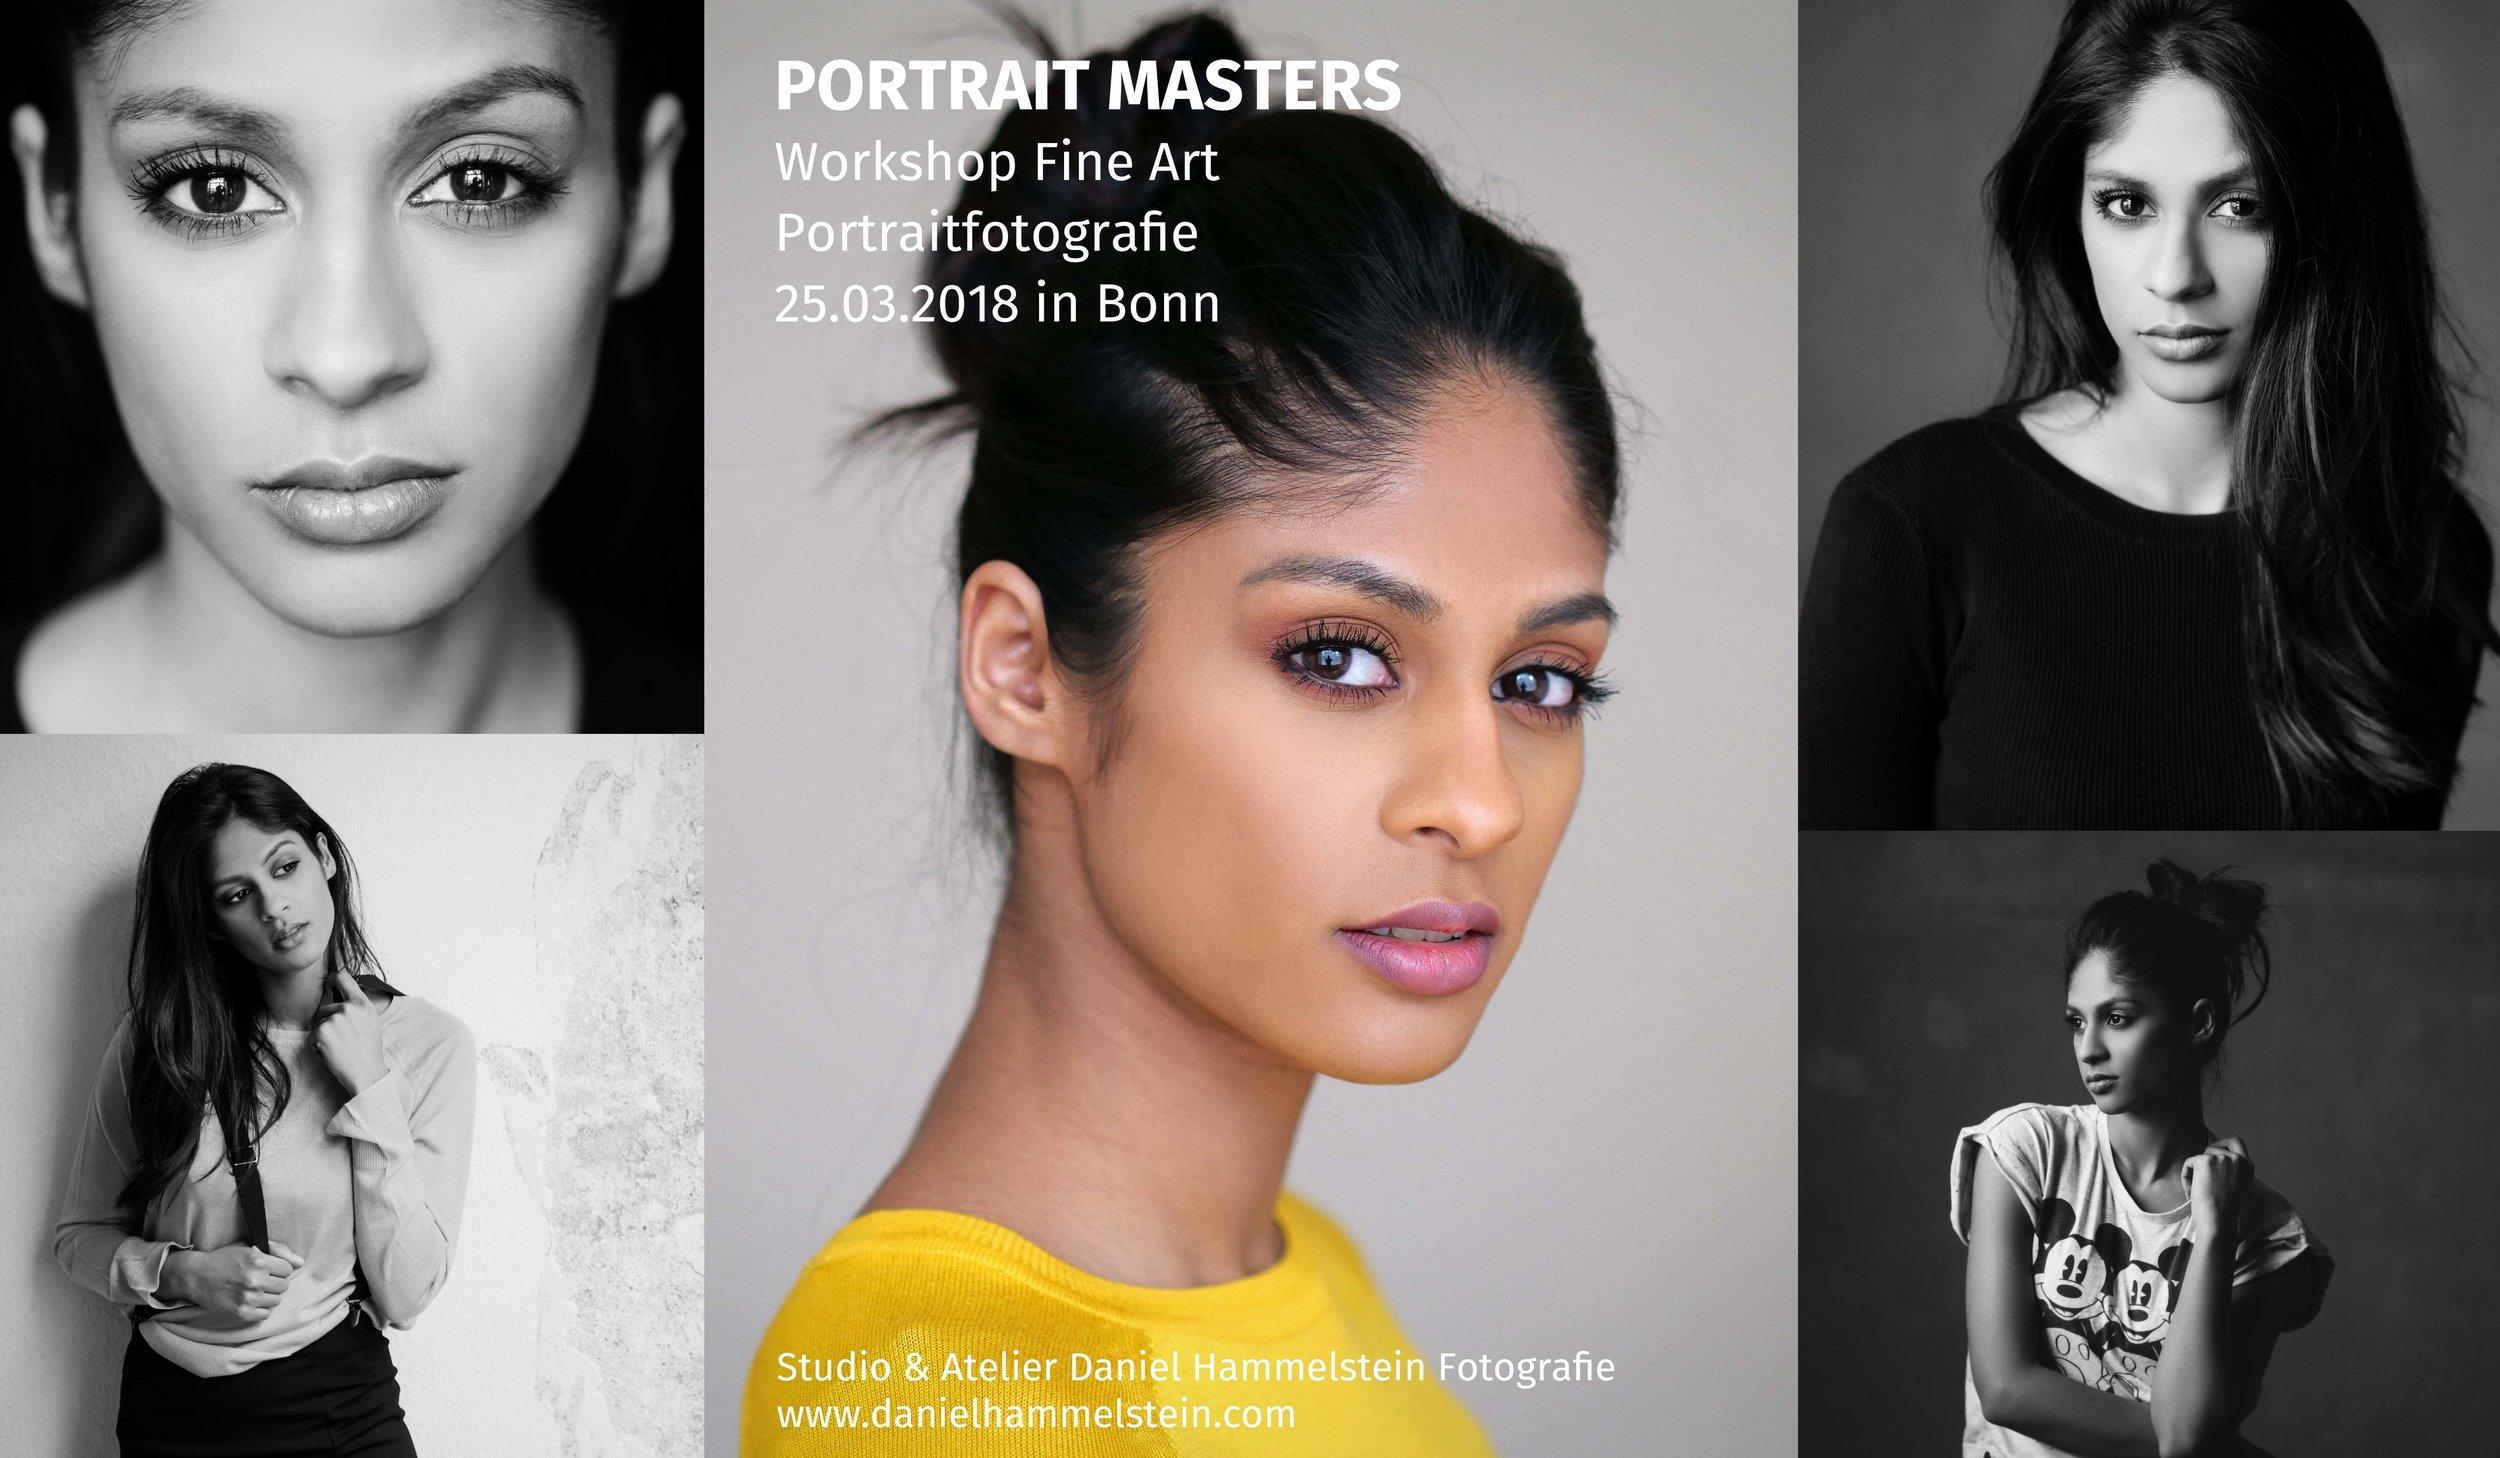 Portrait Porträt Workshop Portraitfotografie Schwarzweiß Fotoworkshop Fotokurs Bonn Köln Düsseldorf NRW März 2018.jpg